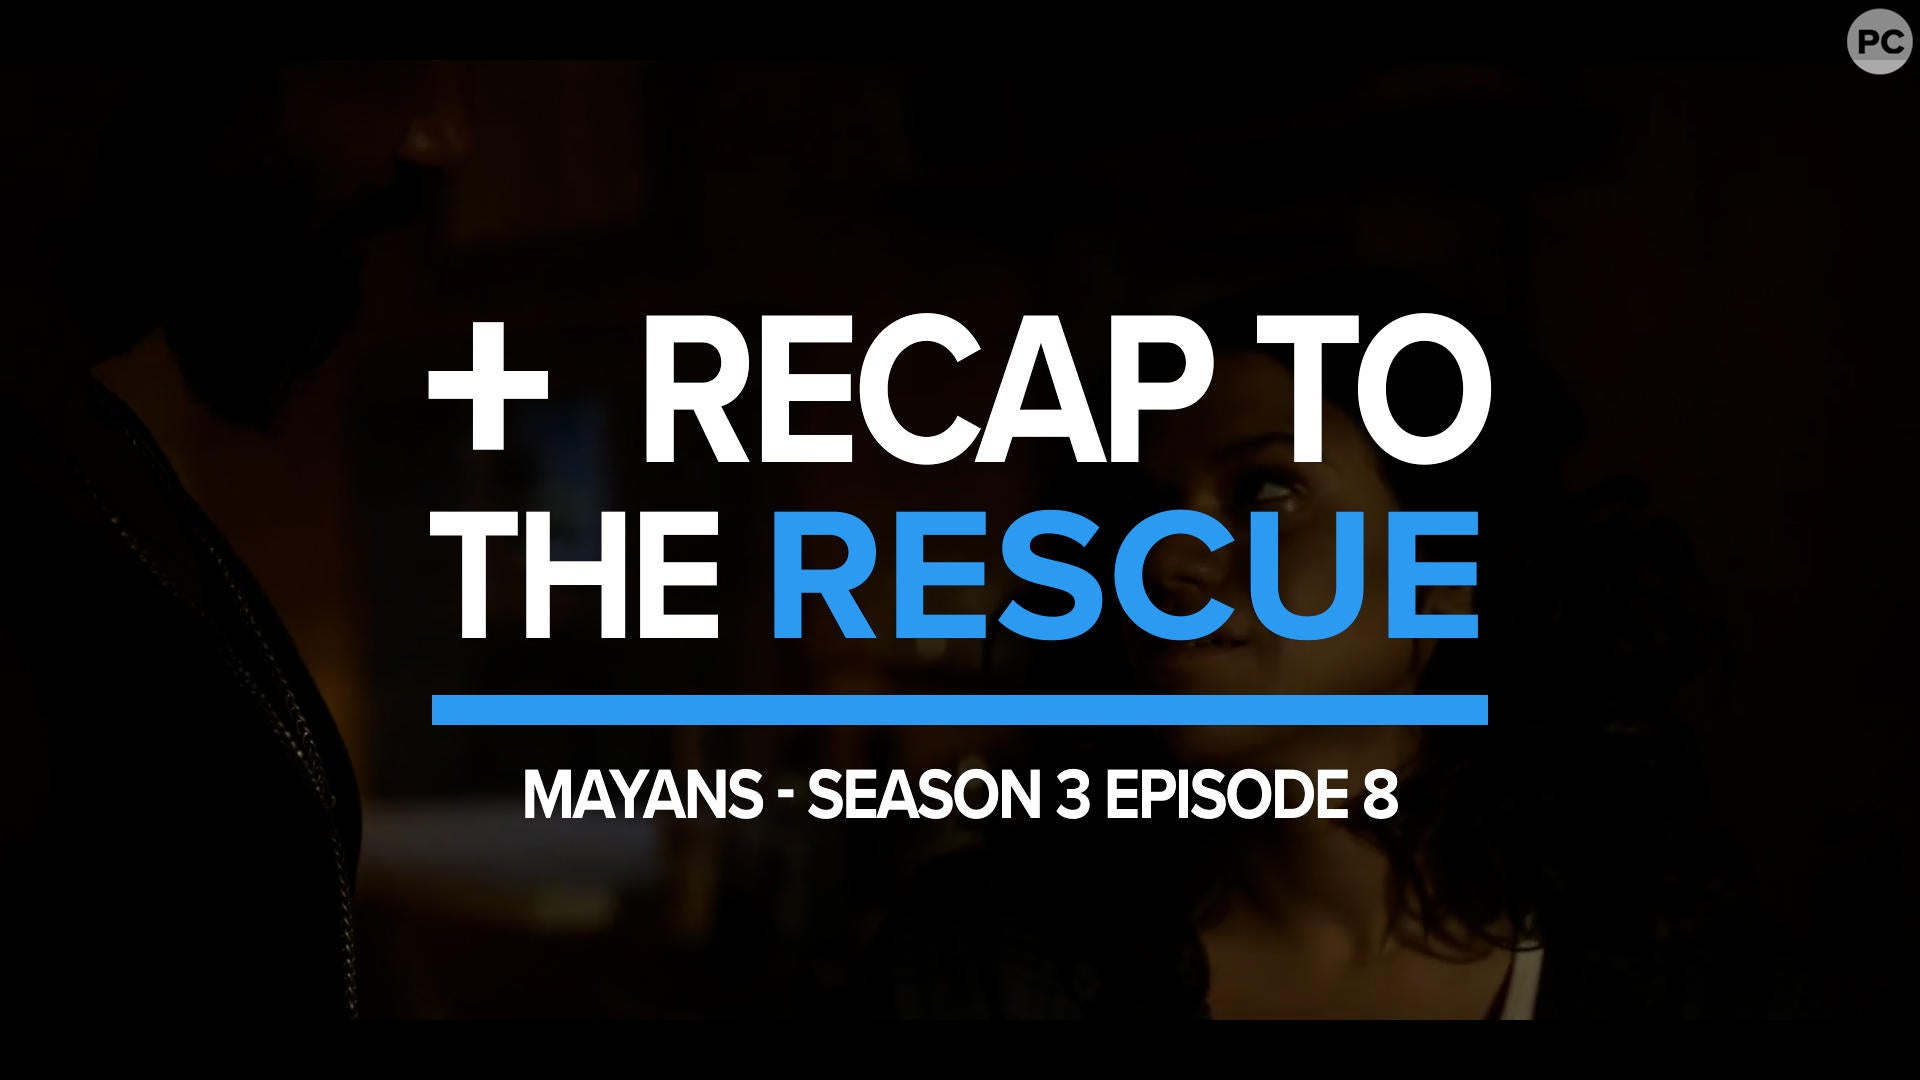 Recap - Mayans Season 3 Episode 8